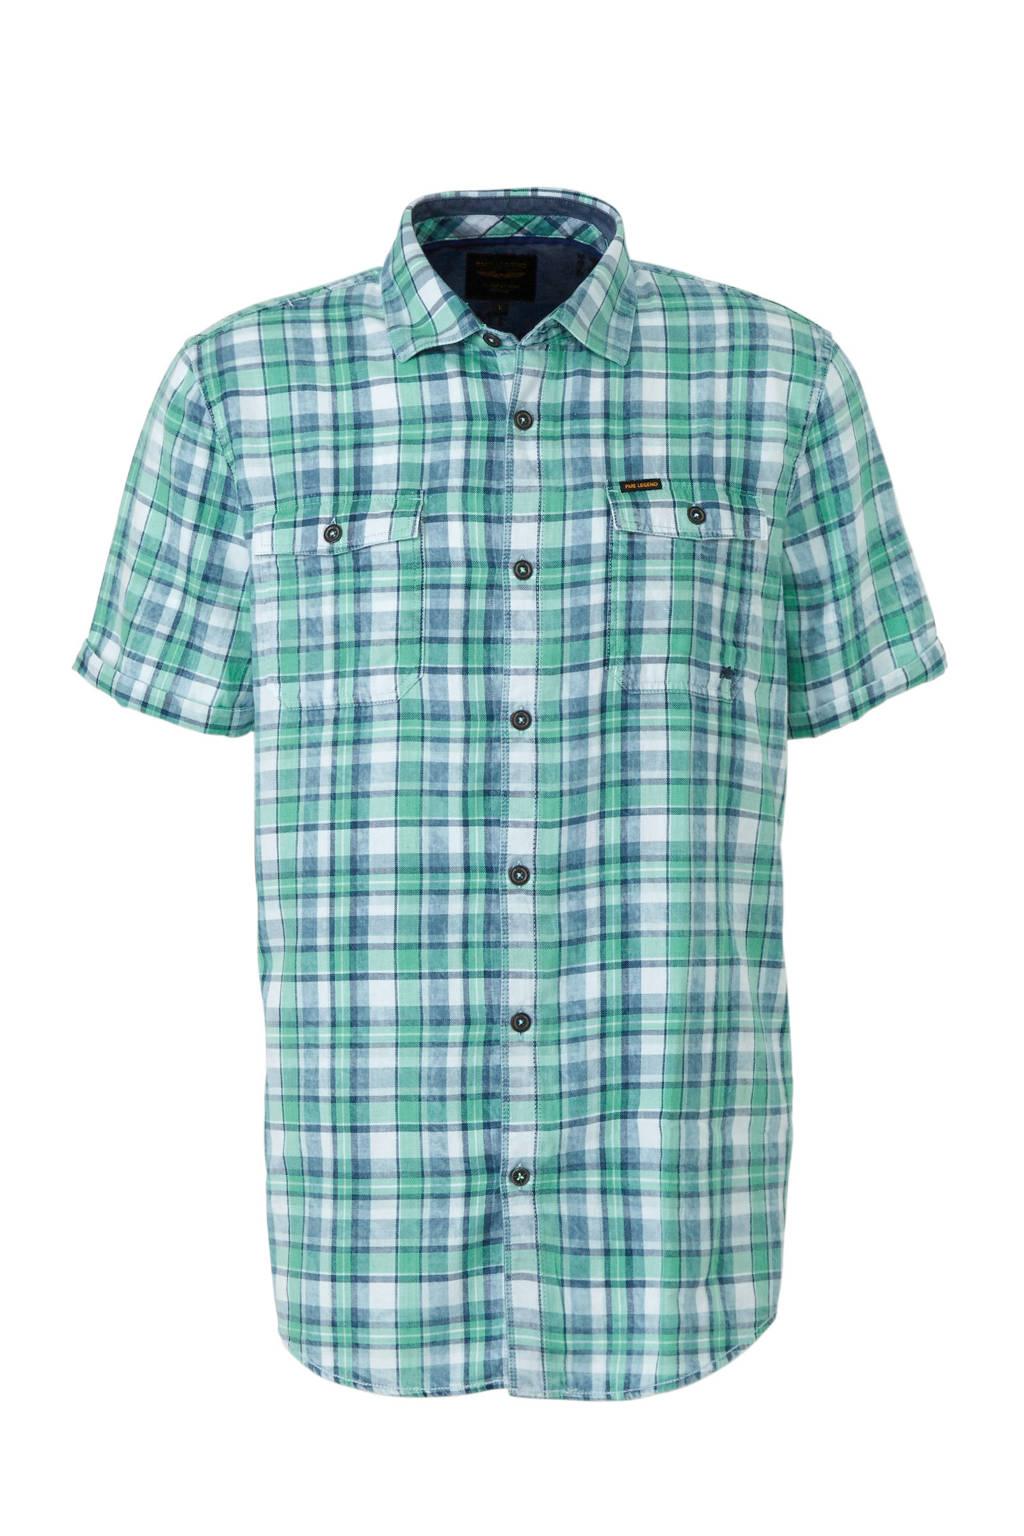 Groen Geruit Overhemd.Pme Legend Geruit Regular Fit Overhemd Wehkamp